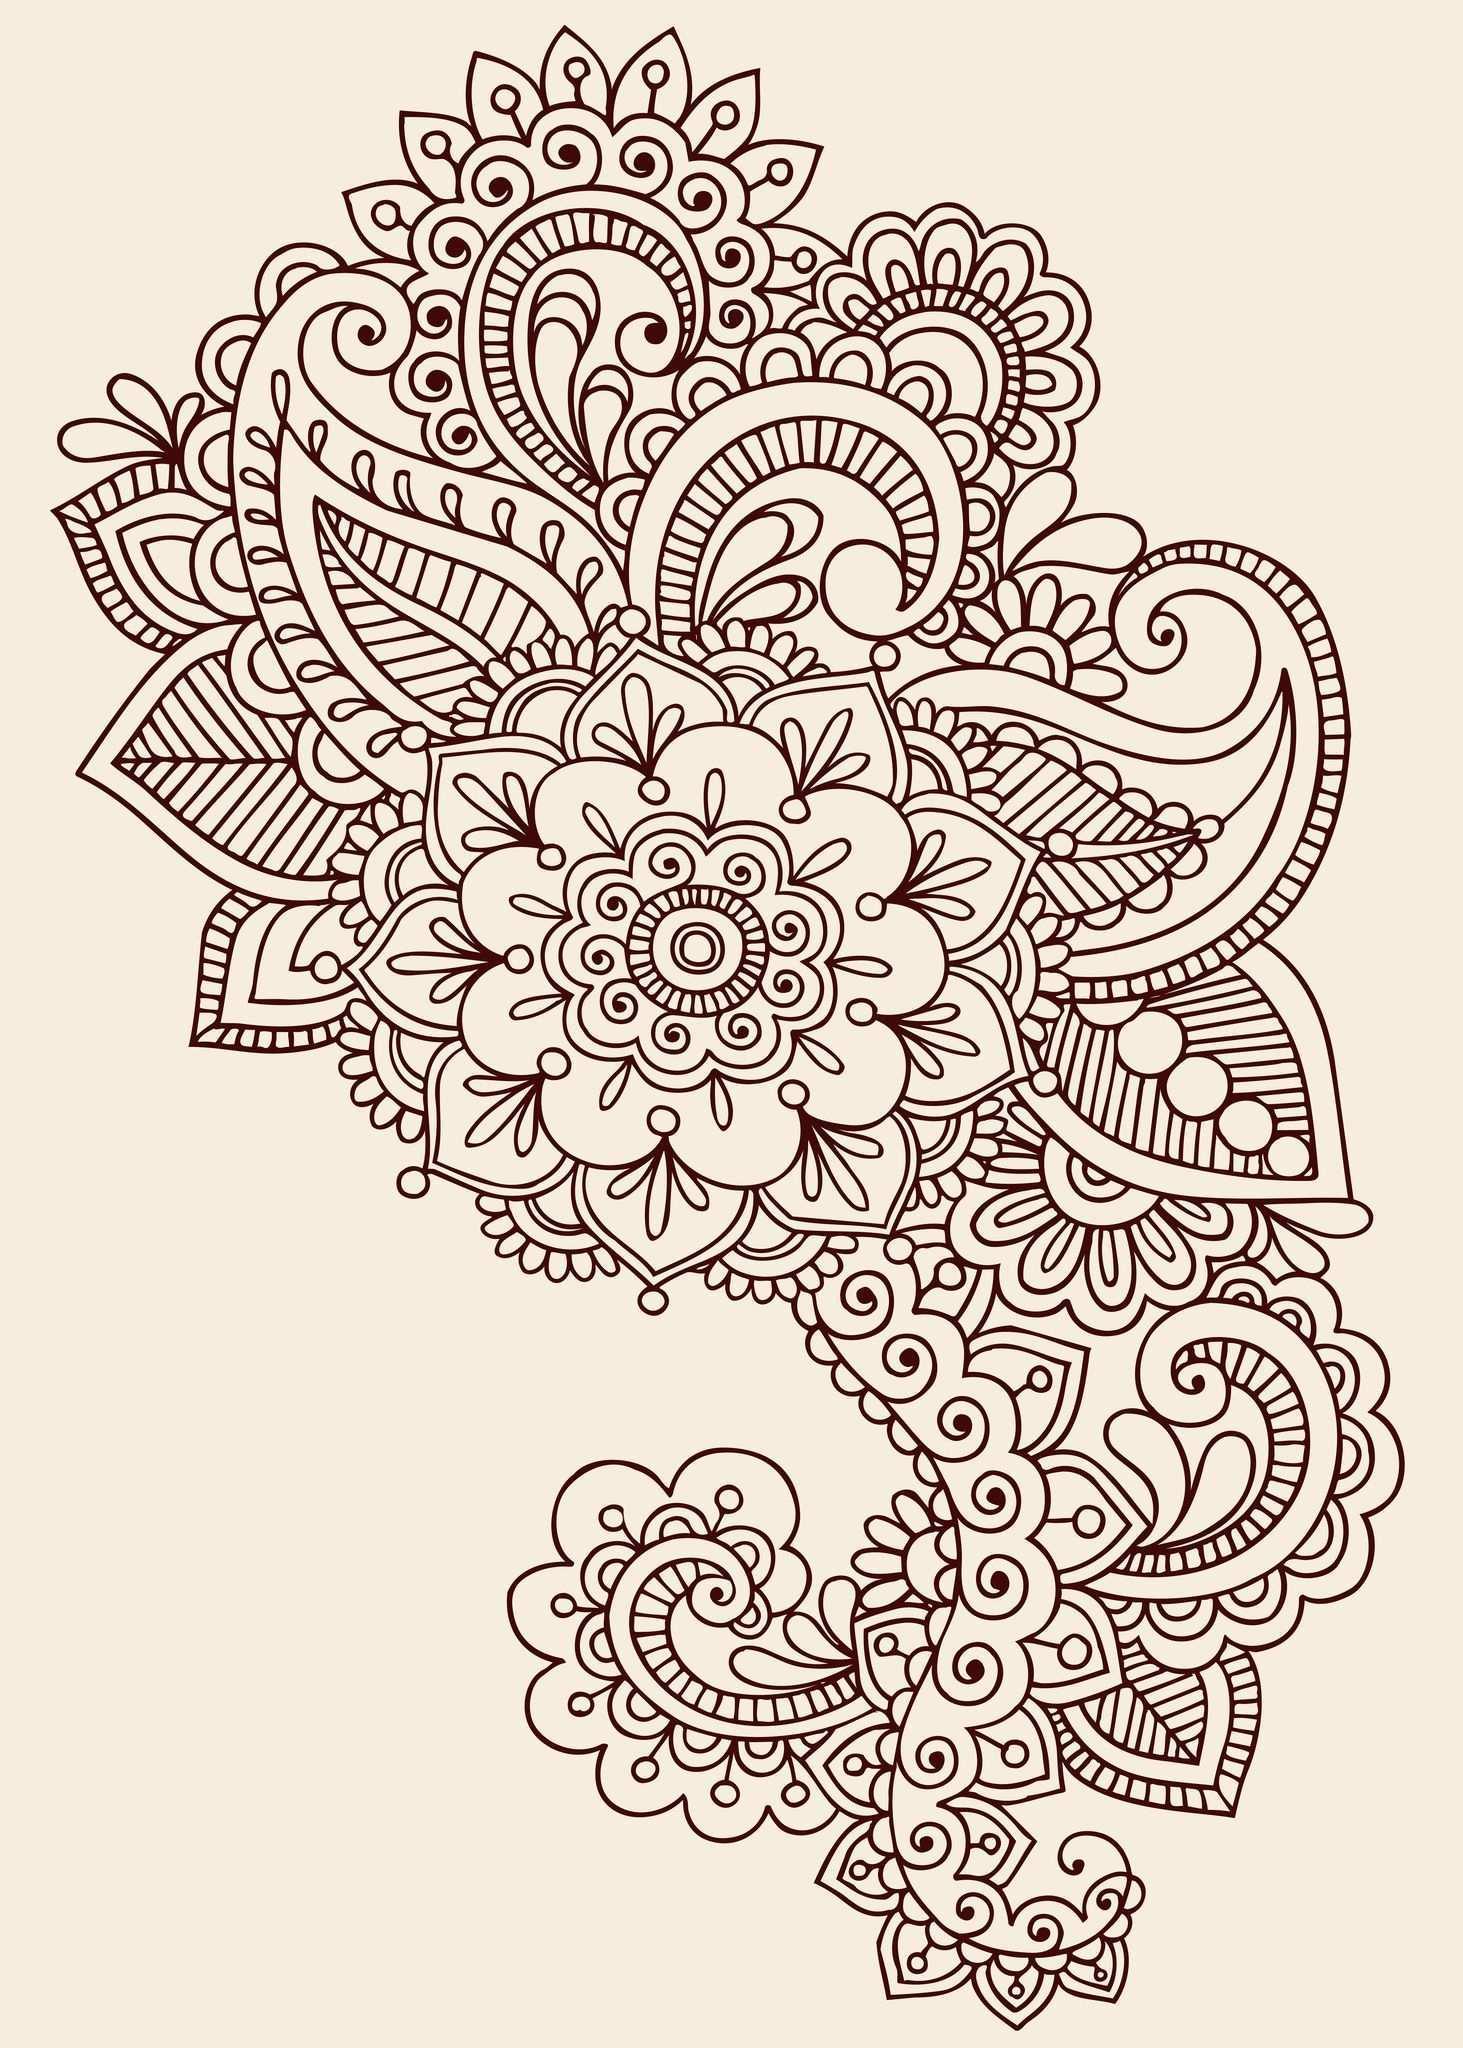 Paisley Designs Paisley Henna Tattoo Design Paisley Doodle Doodle Design Henna Tatowierung